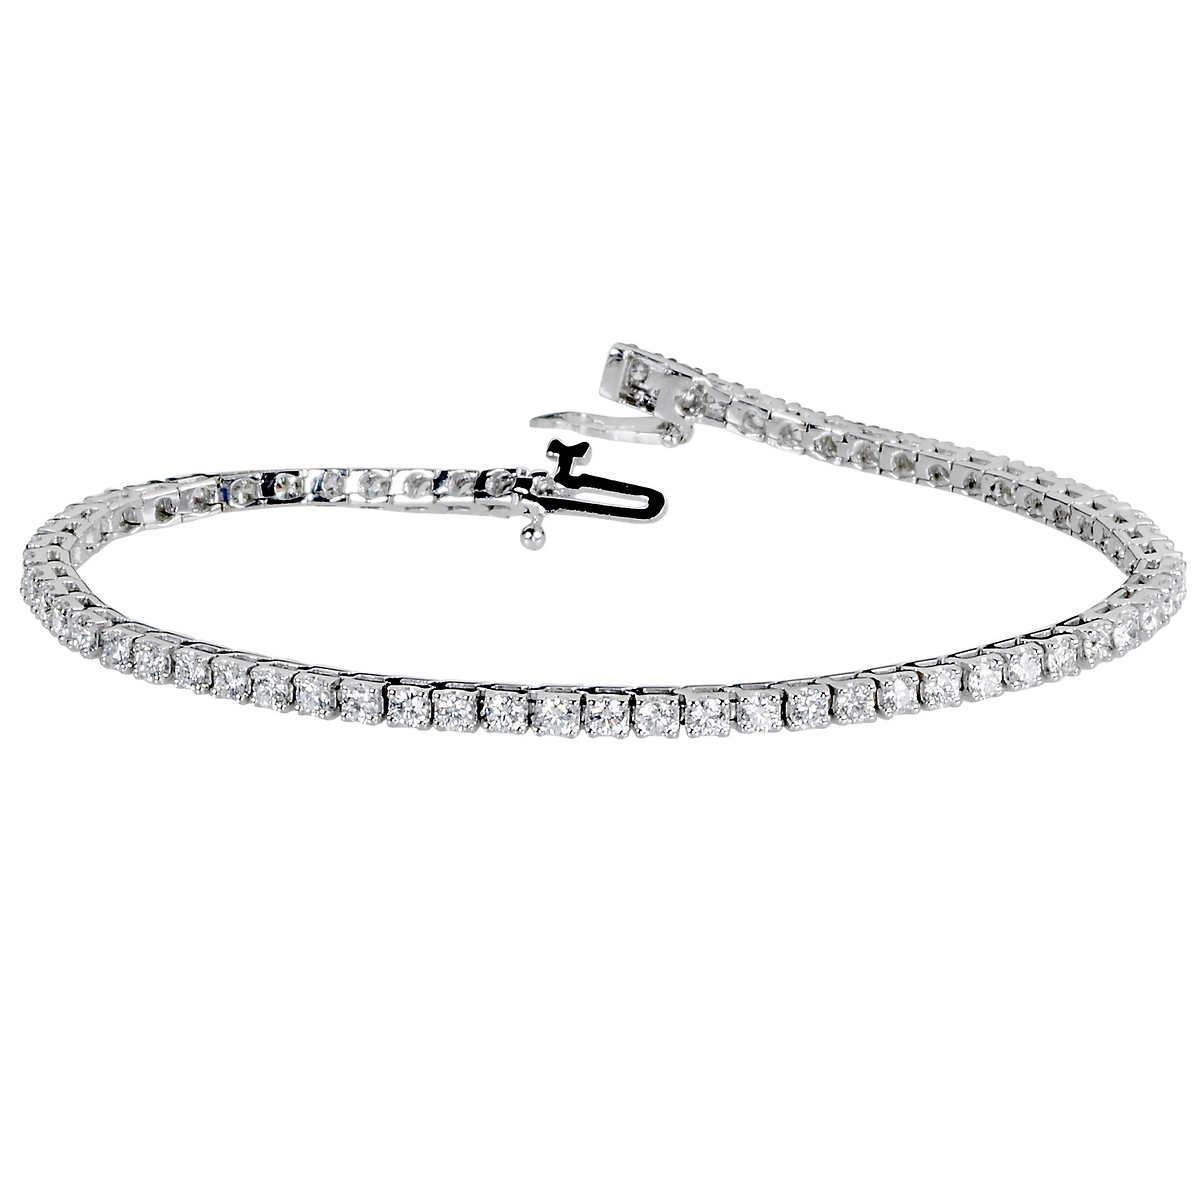 Round Brilliant 300 Ctw Vs2 Clarity, I Color Diamond 14kt White Gold  Bracelet